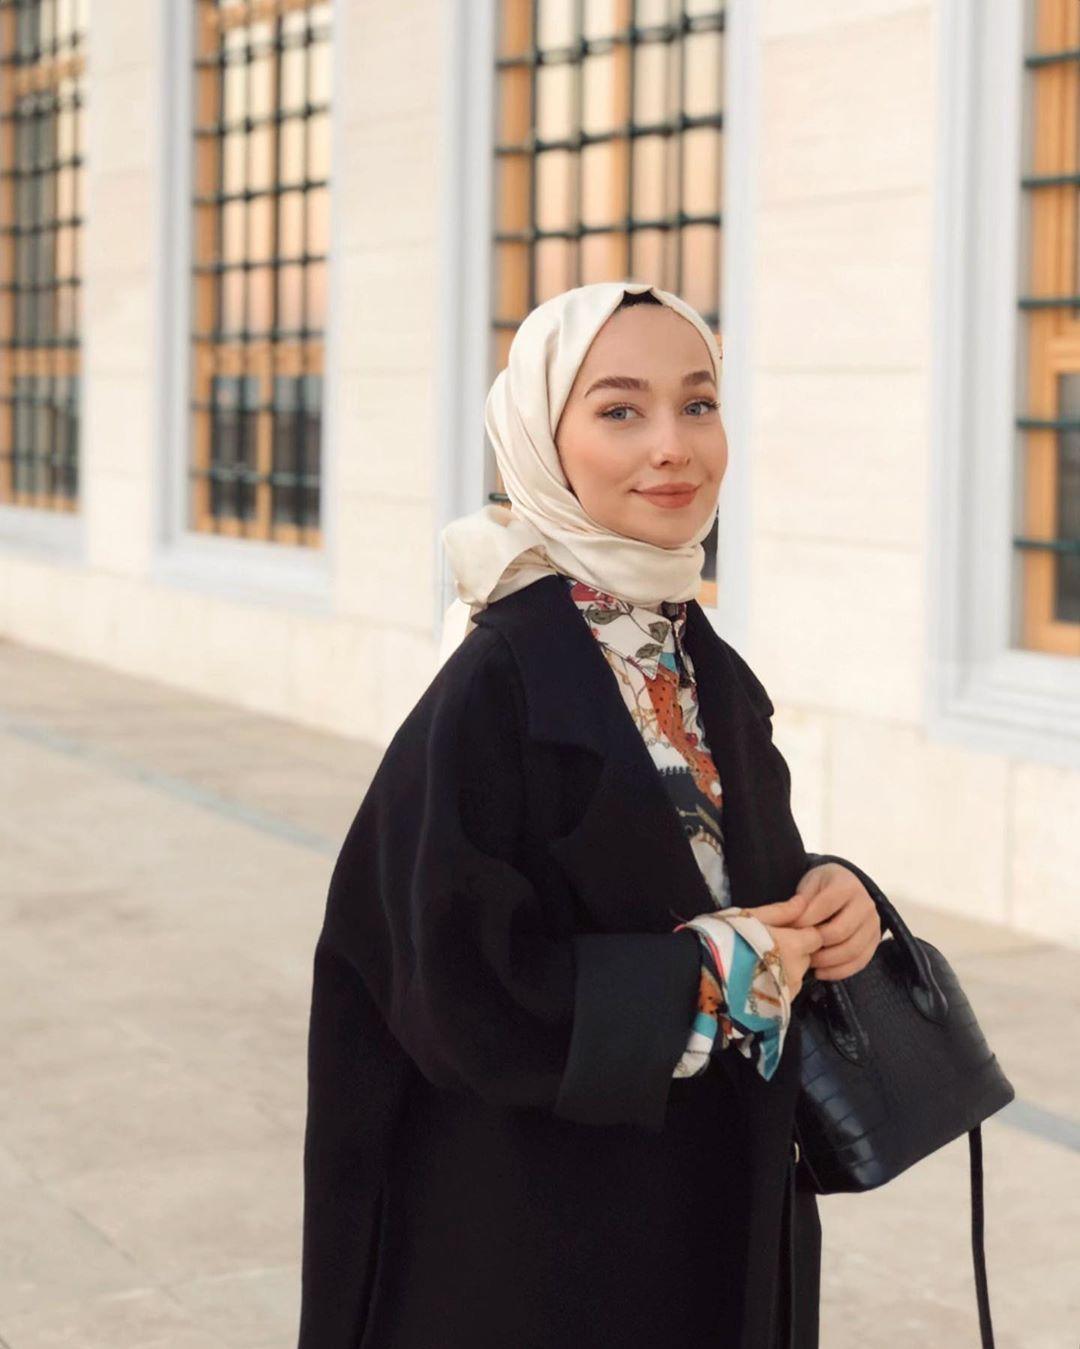 Instagram Da Betul In 2020 Girl Hijab Hijab Fashion Fashion